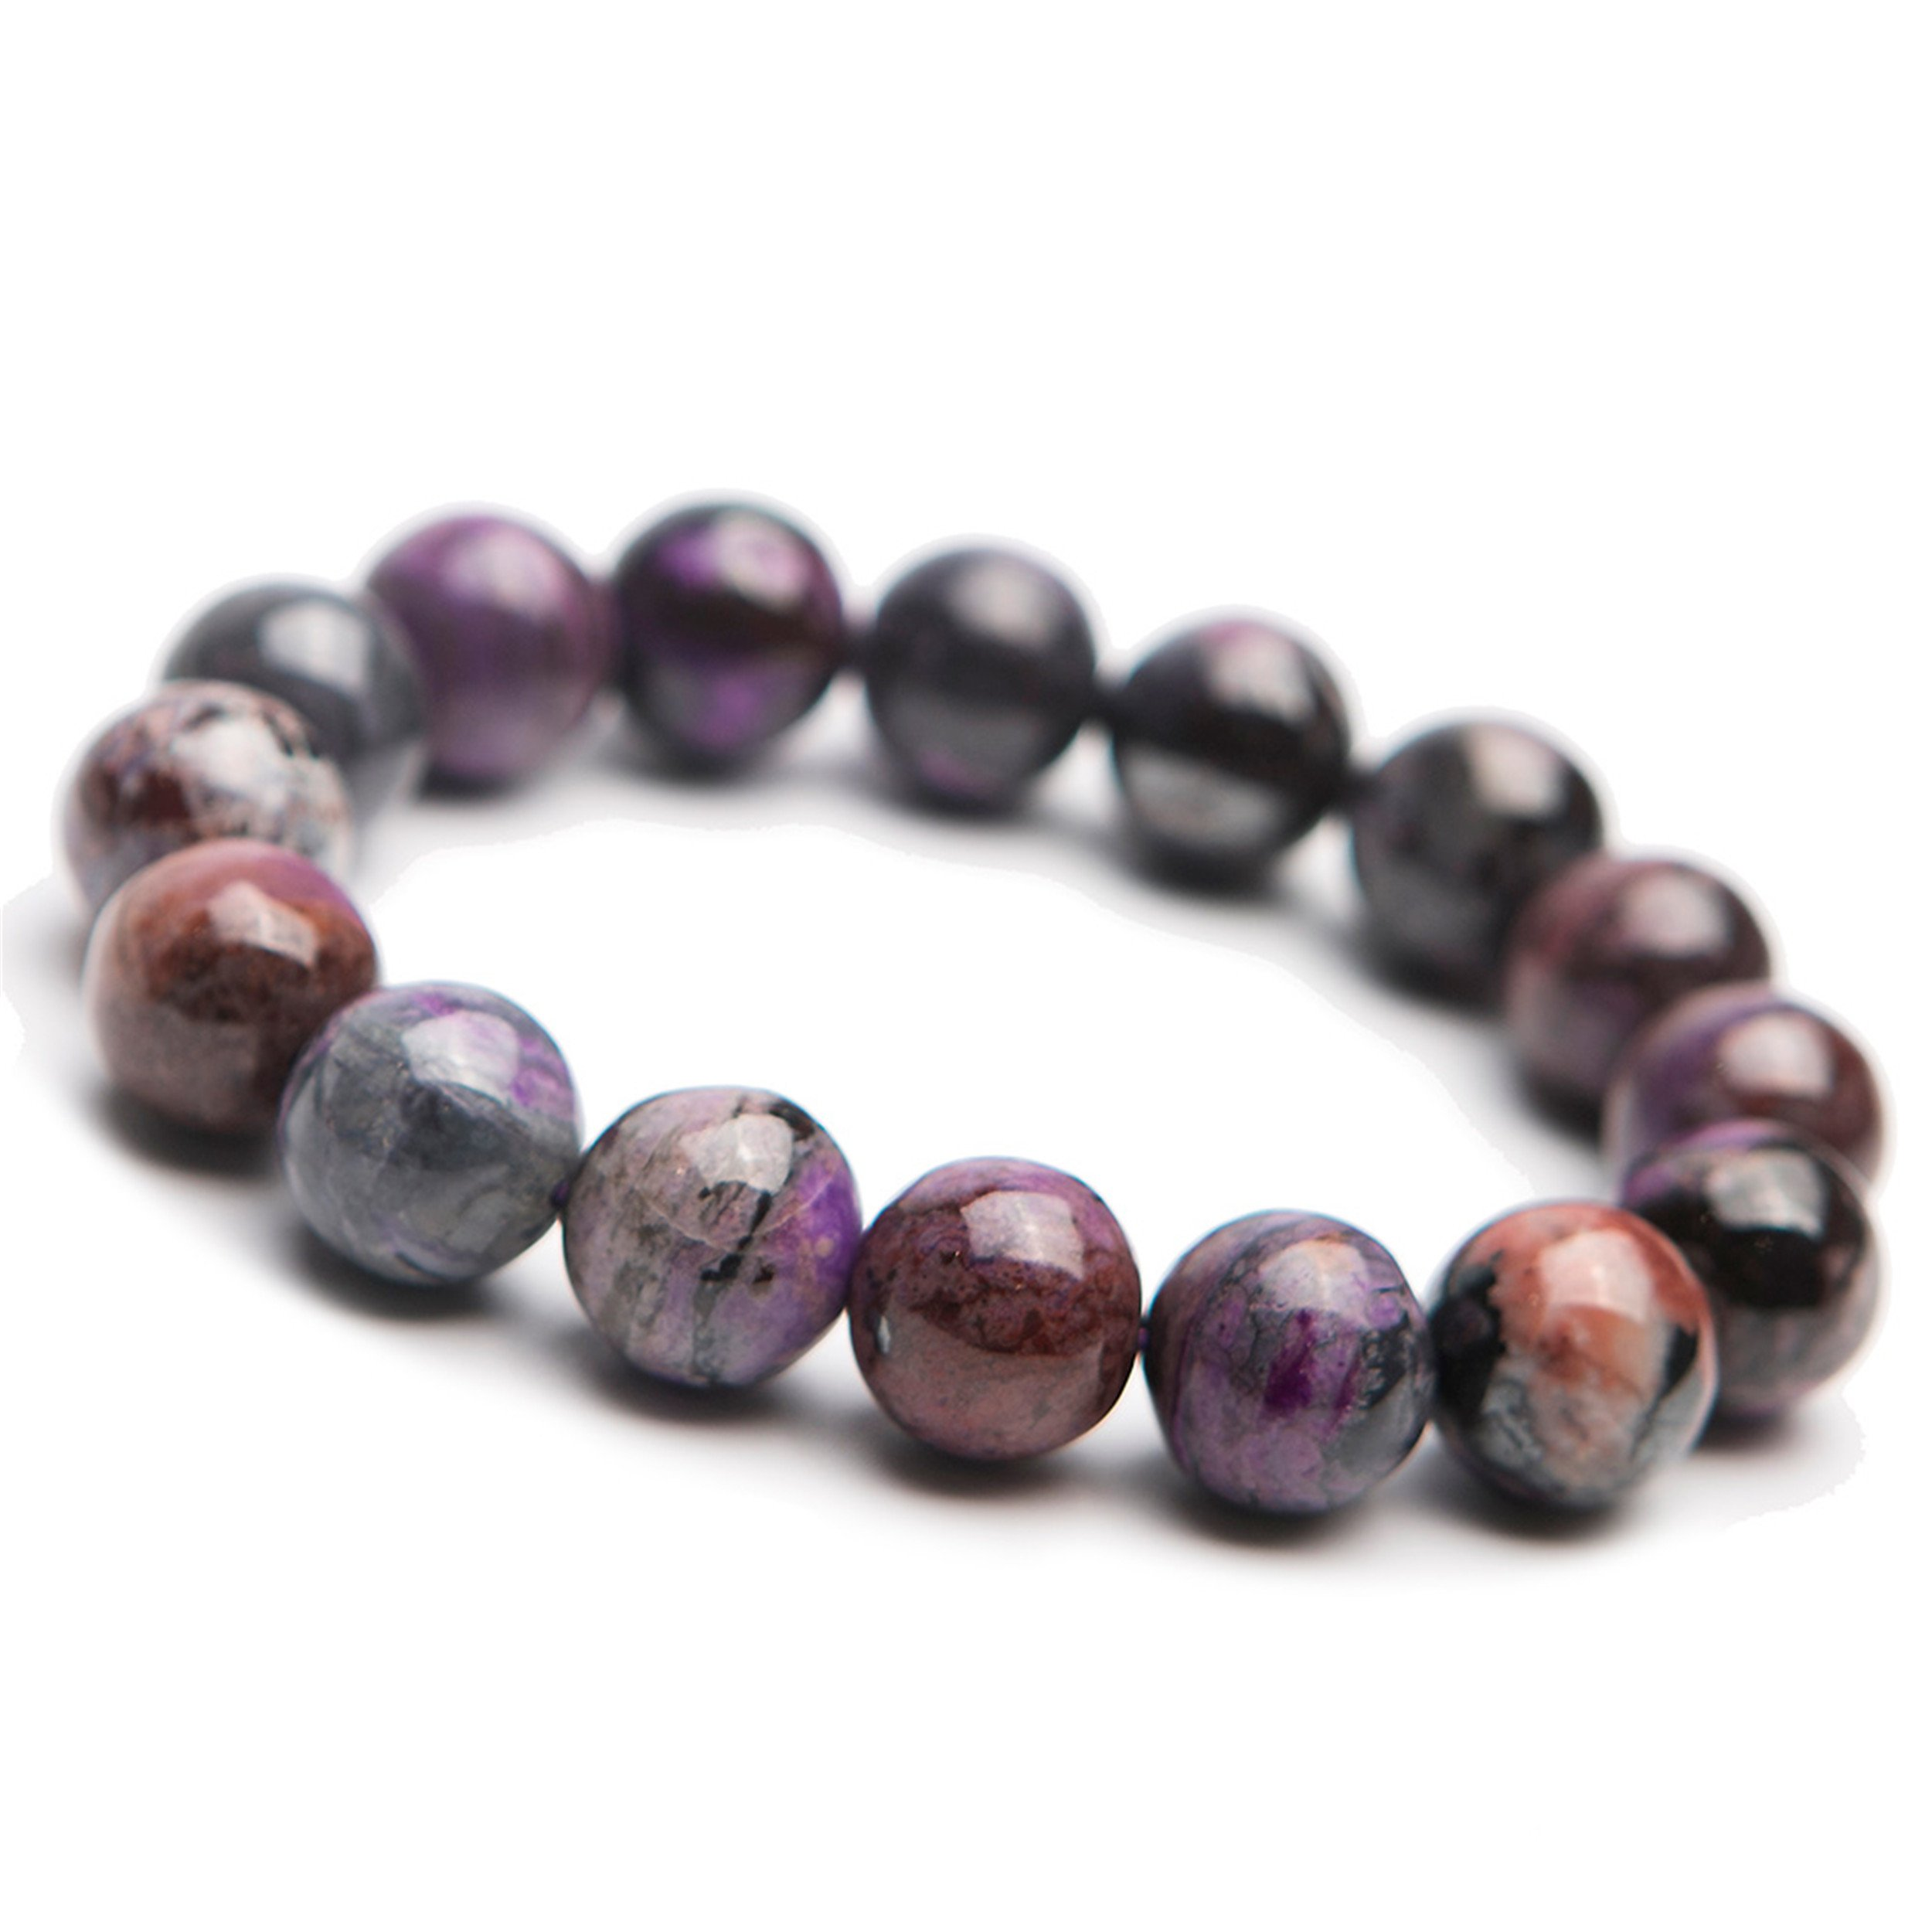 14mm Natural Genuine Purple Sugilite Gemstone Round Big Bead Stretch Bracelet